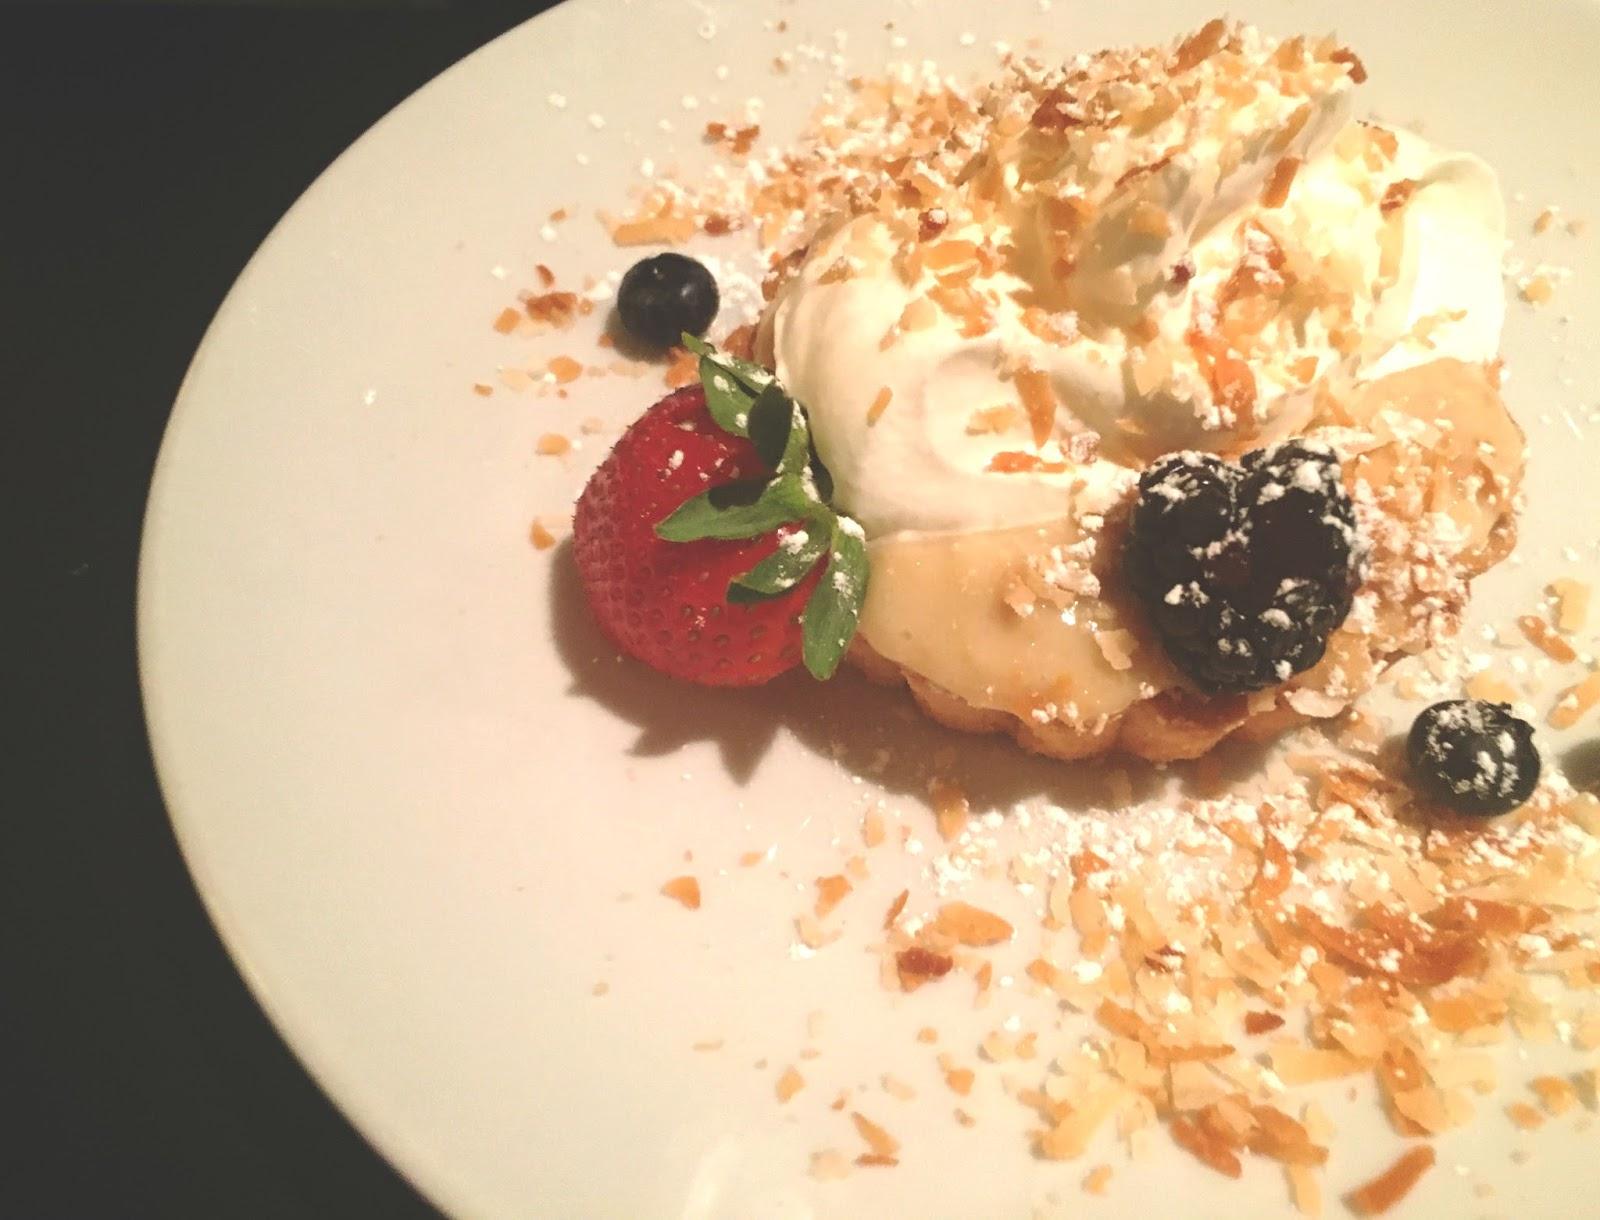 coconut cream pie at Shade, a restaurant in Houston, Texas